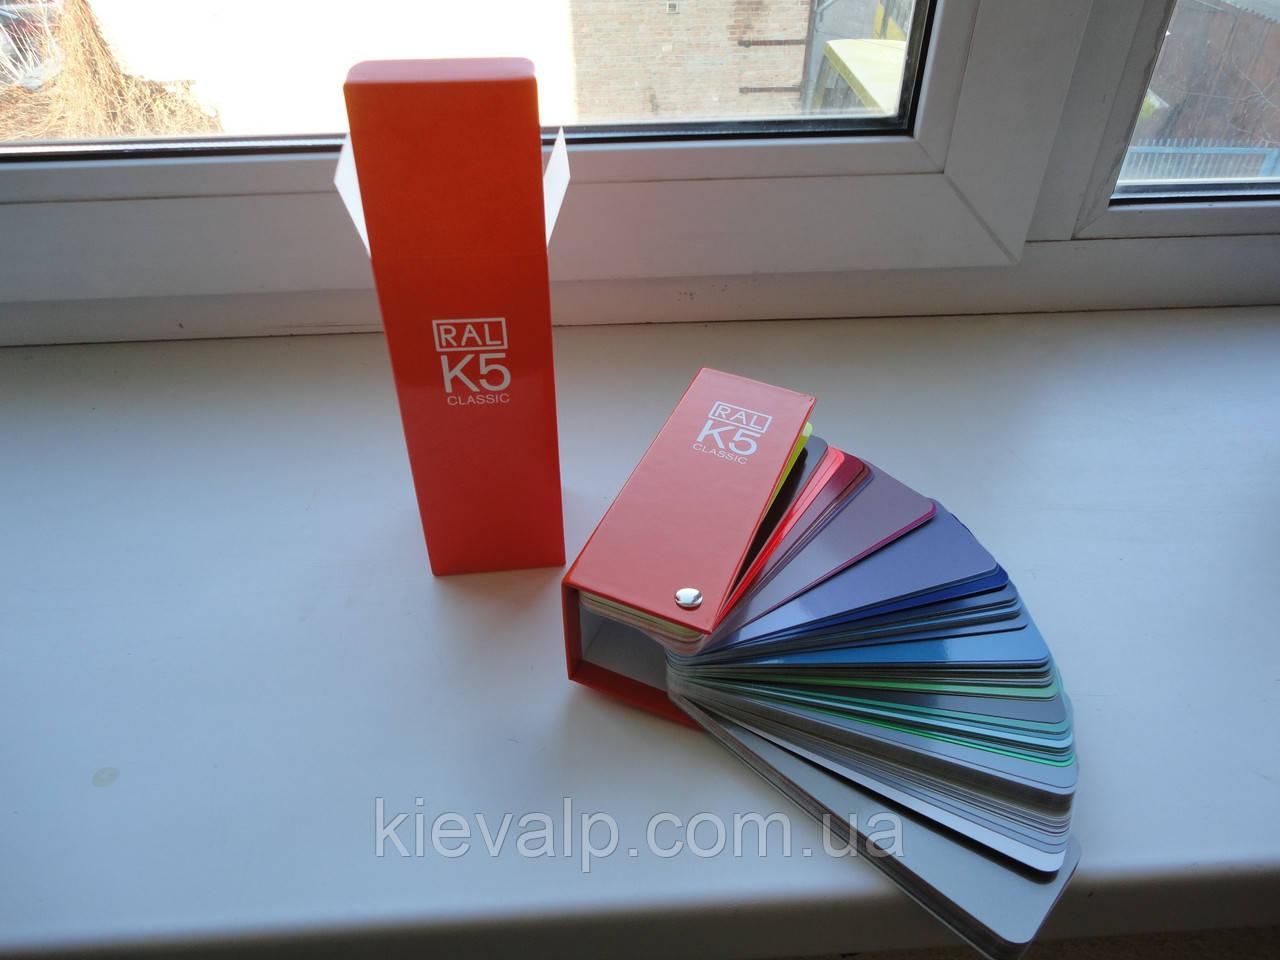 RAL K5 Каталог цветов, РАЛ К5, цветовой веер, раскладка, палитра